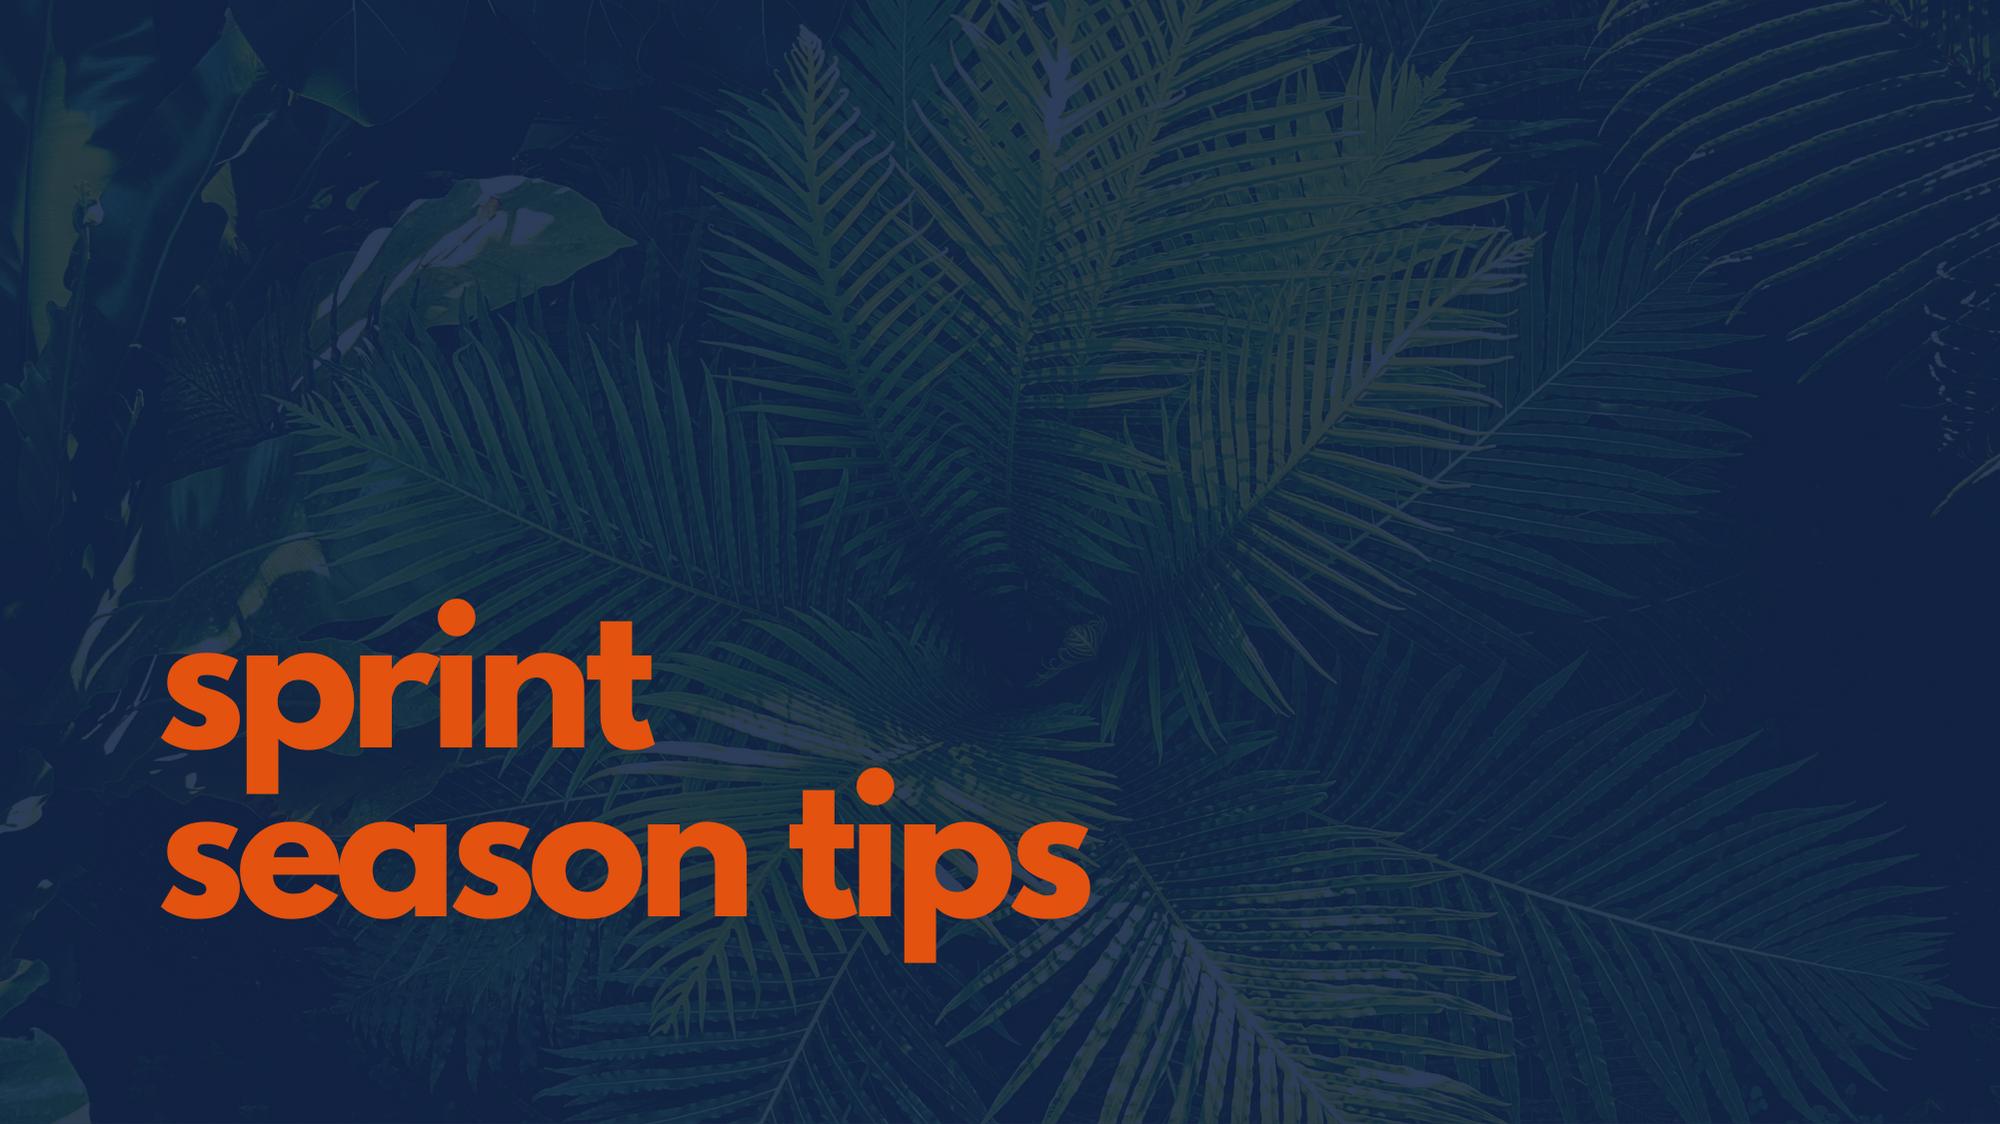 sprint season tips